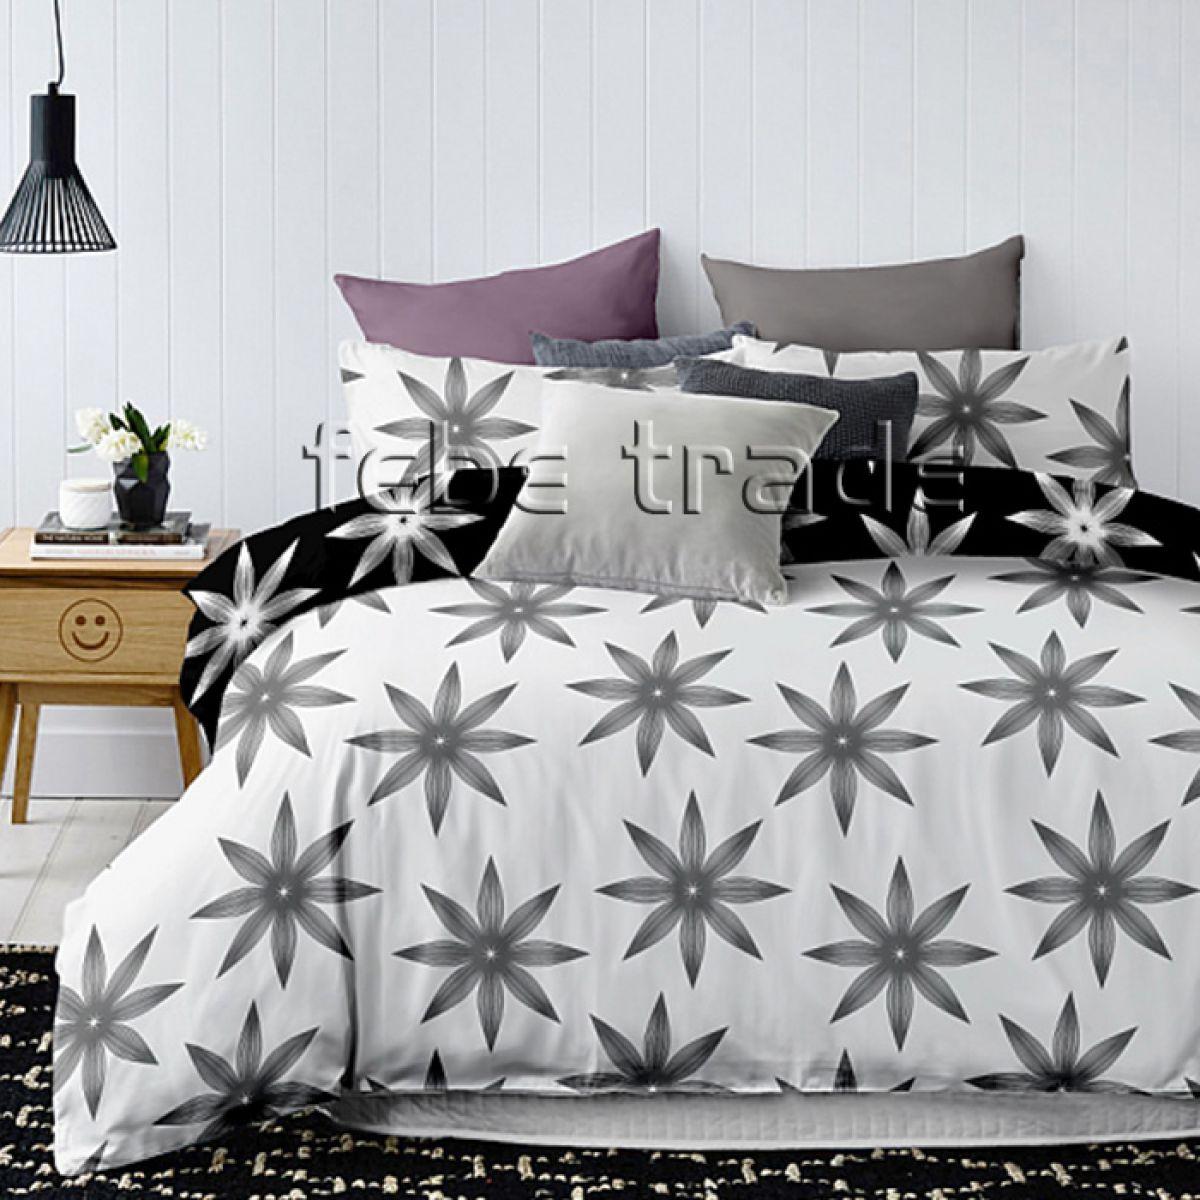 Double-sided Beddings - TZ-334 - 160x200 cm - 4 pcs